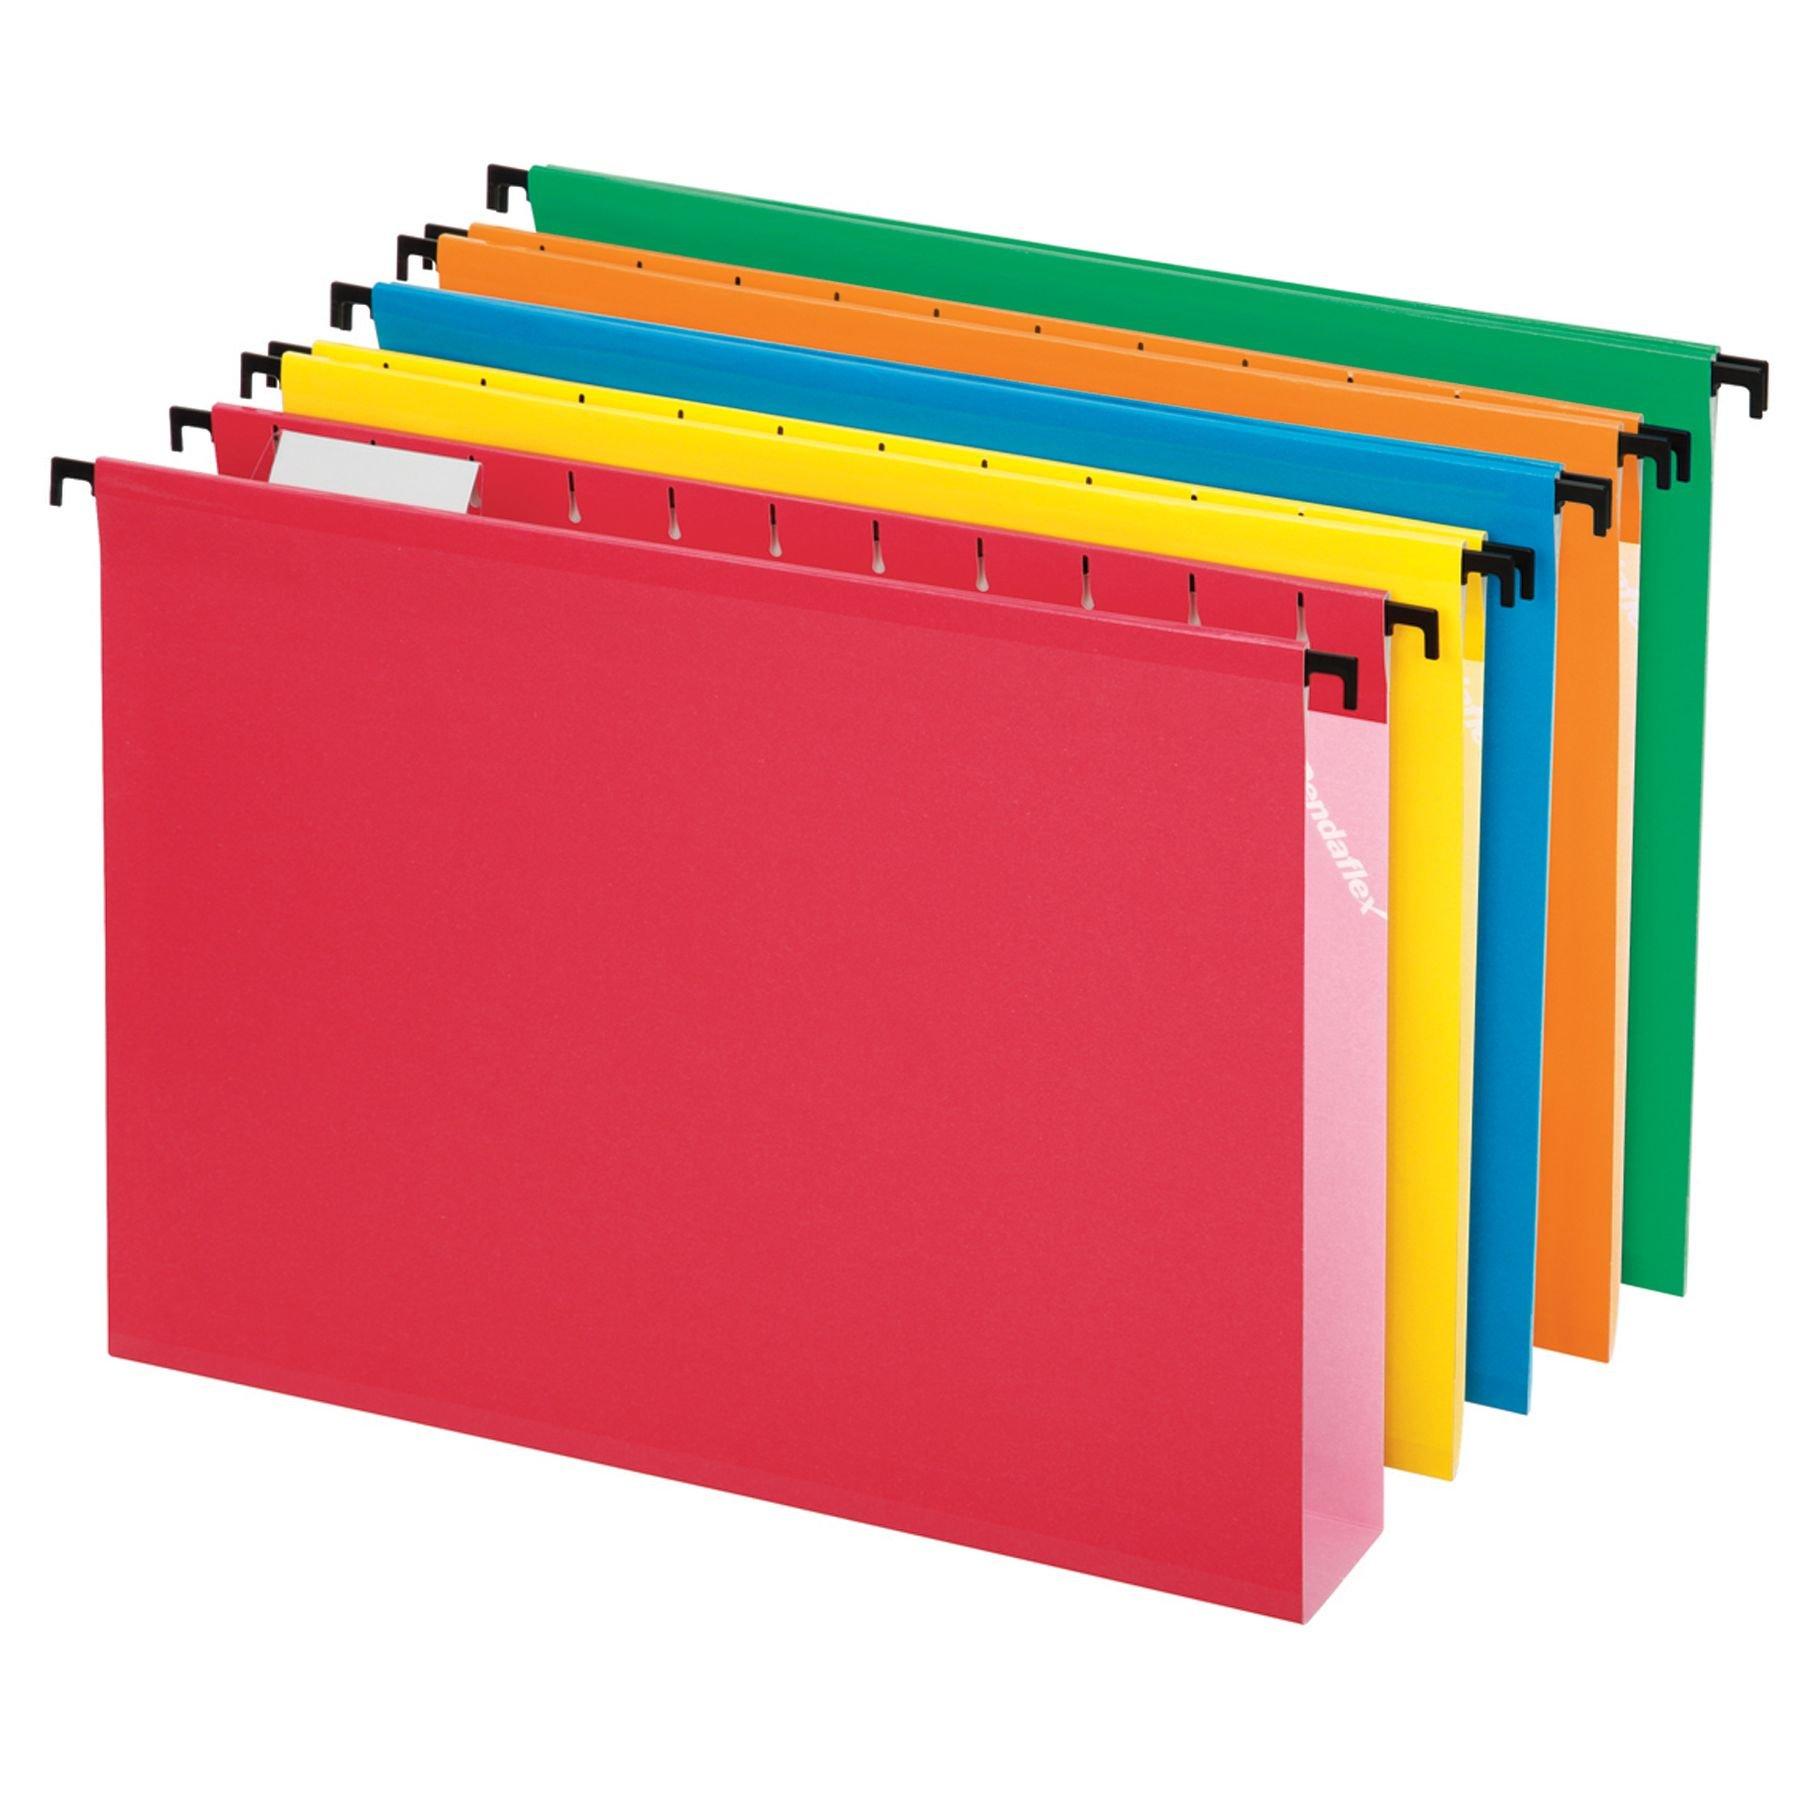 Pendaflex SureHook Extra Capacity Reinforced Hanging Folders, Letter Size, Assorted Colors, Total of 20 Folders per Box (6152X2 ASST) by Pendaflex